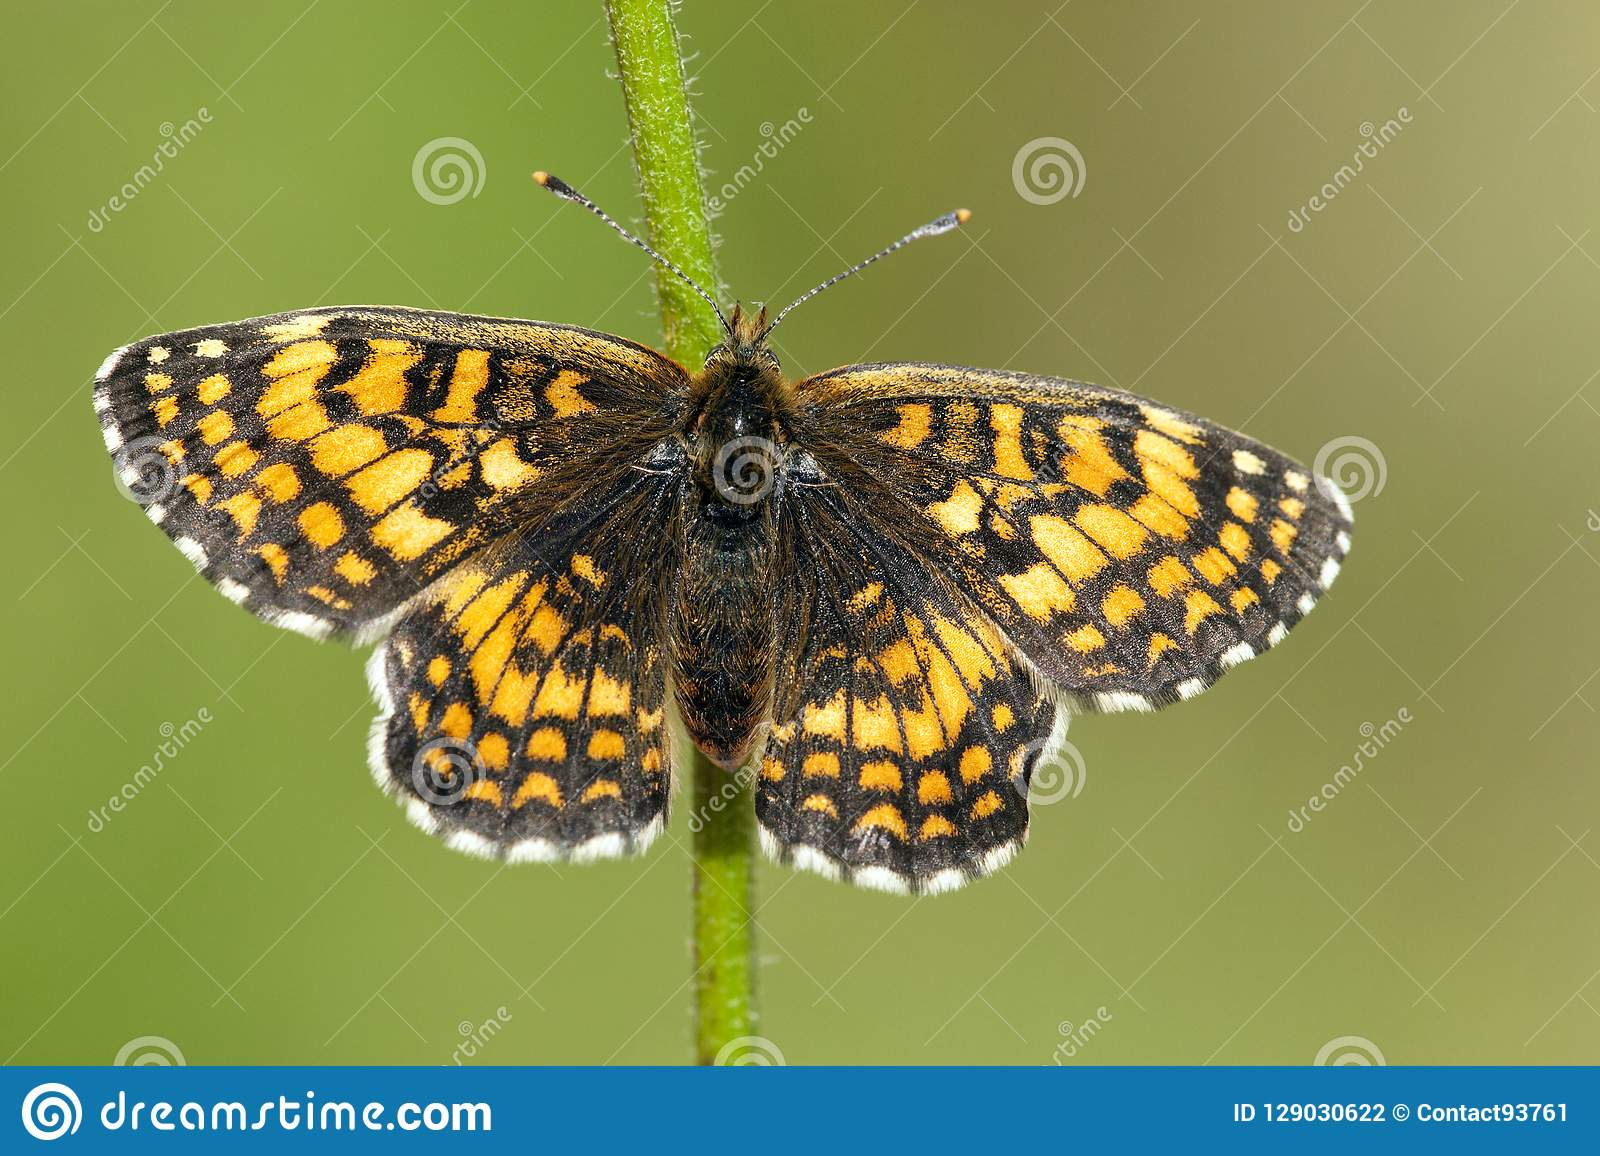 Bosparelmoervlinder,荒地贝母, Melitaea athalia